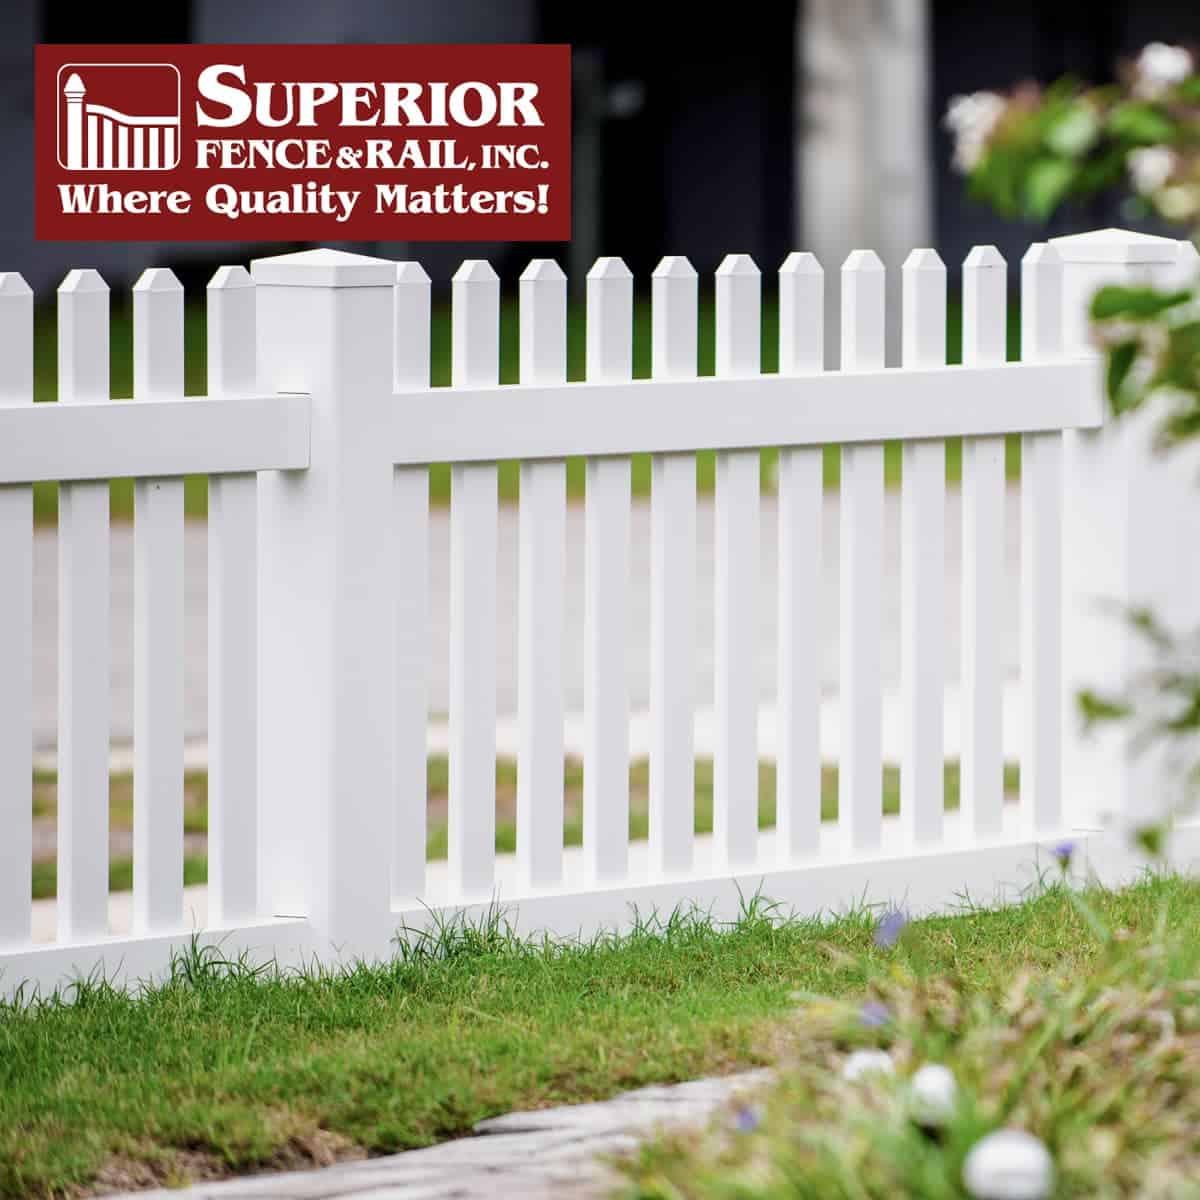 Walker fence company contractor